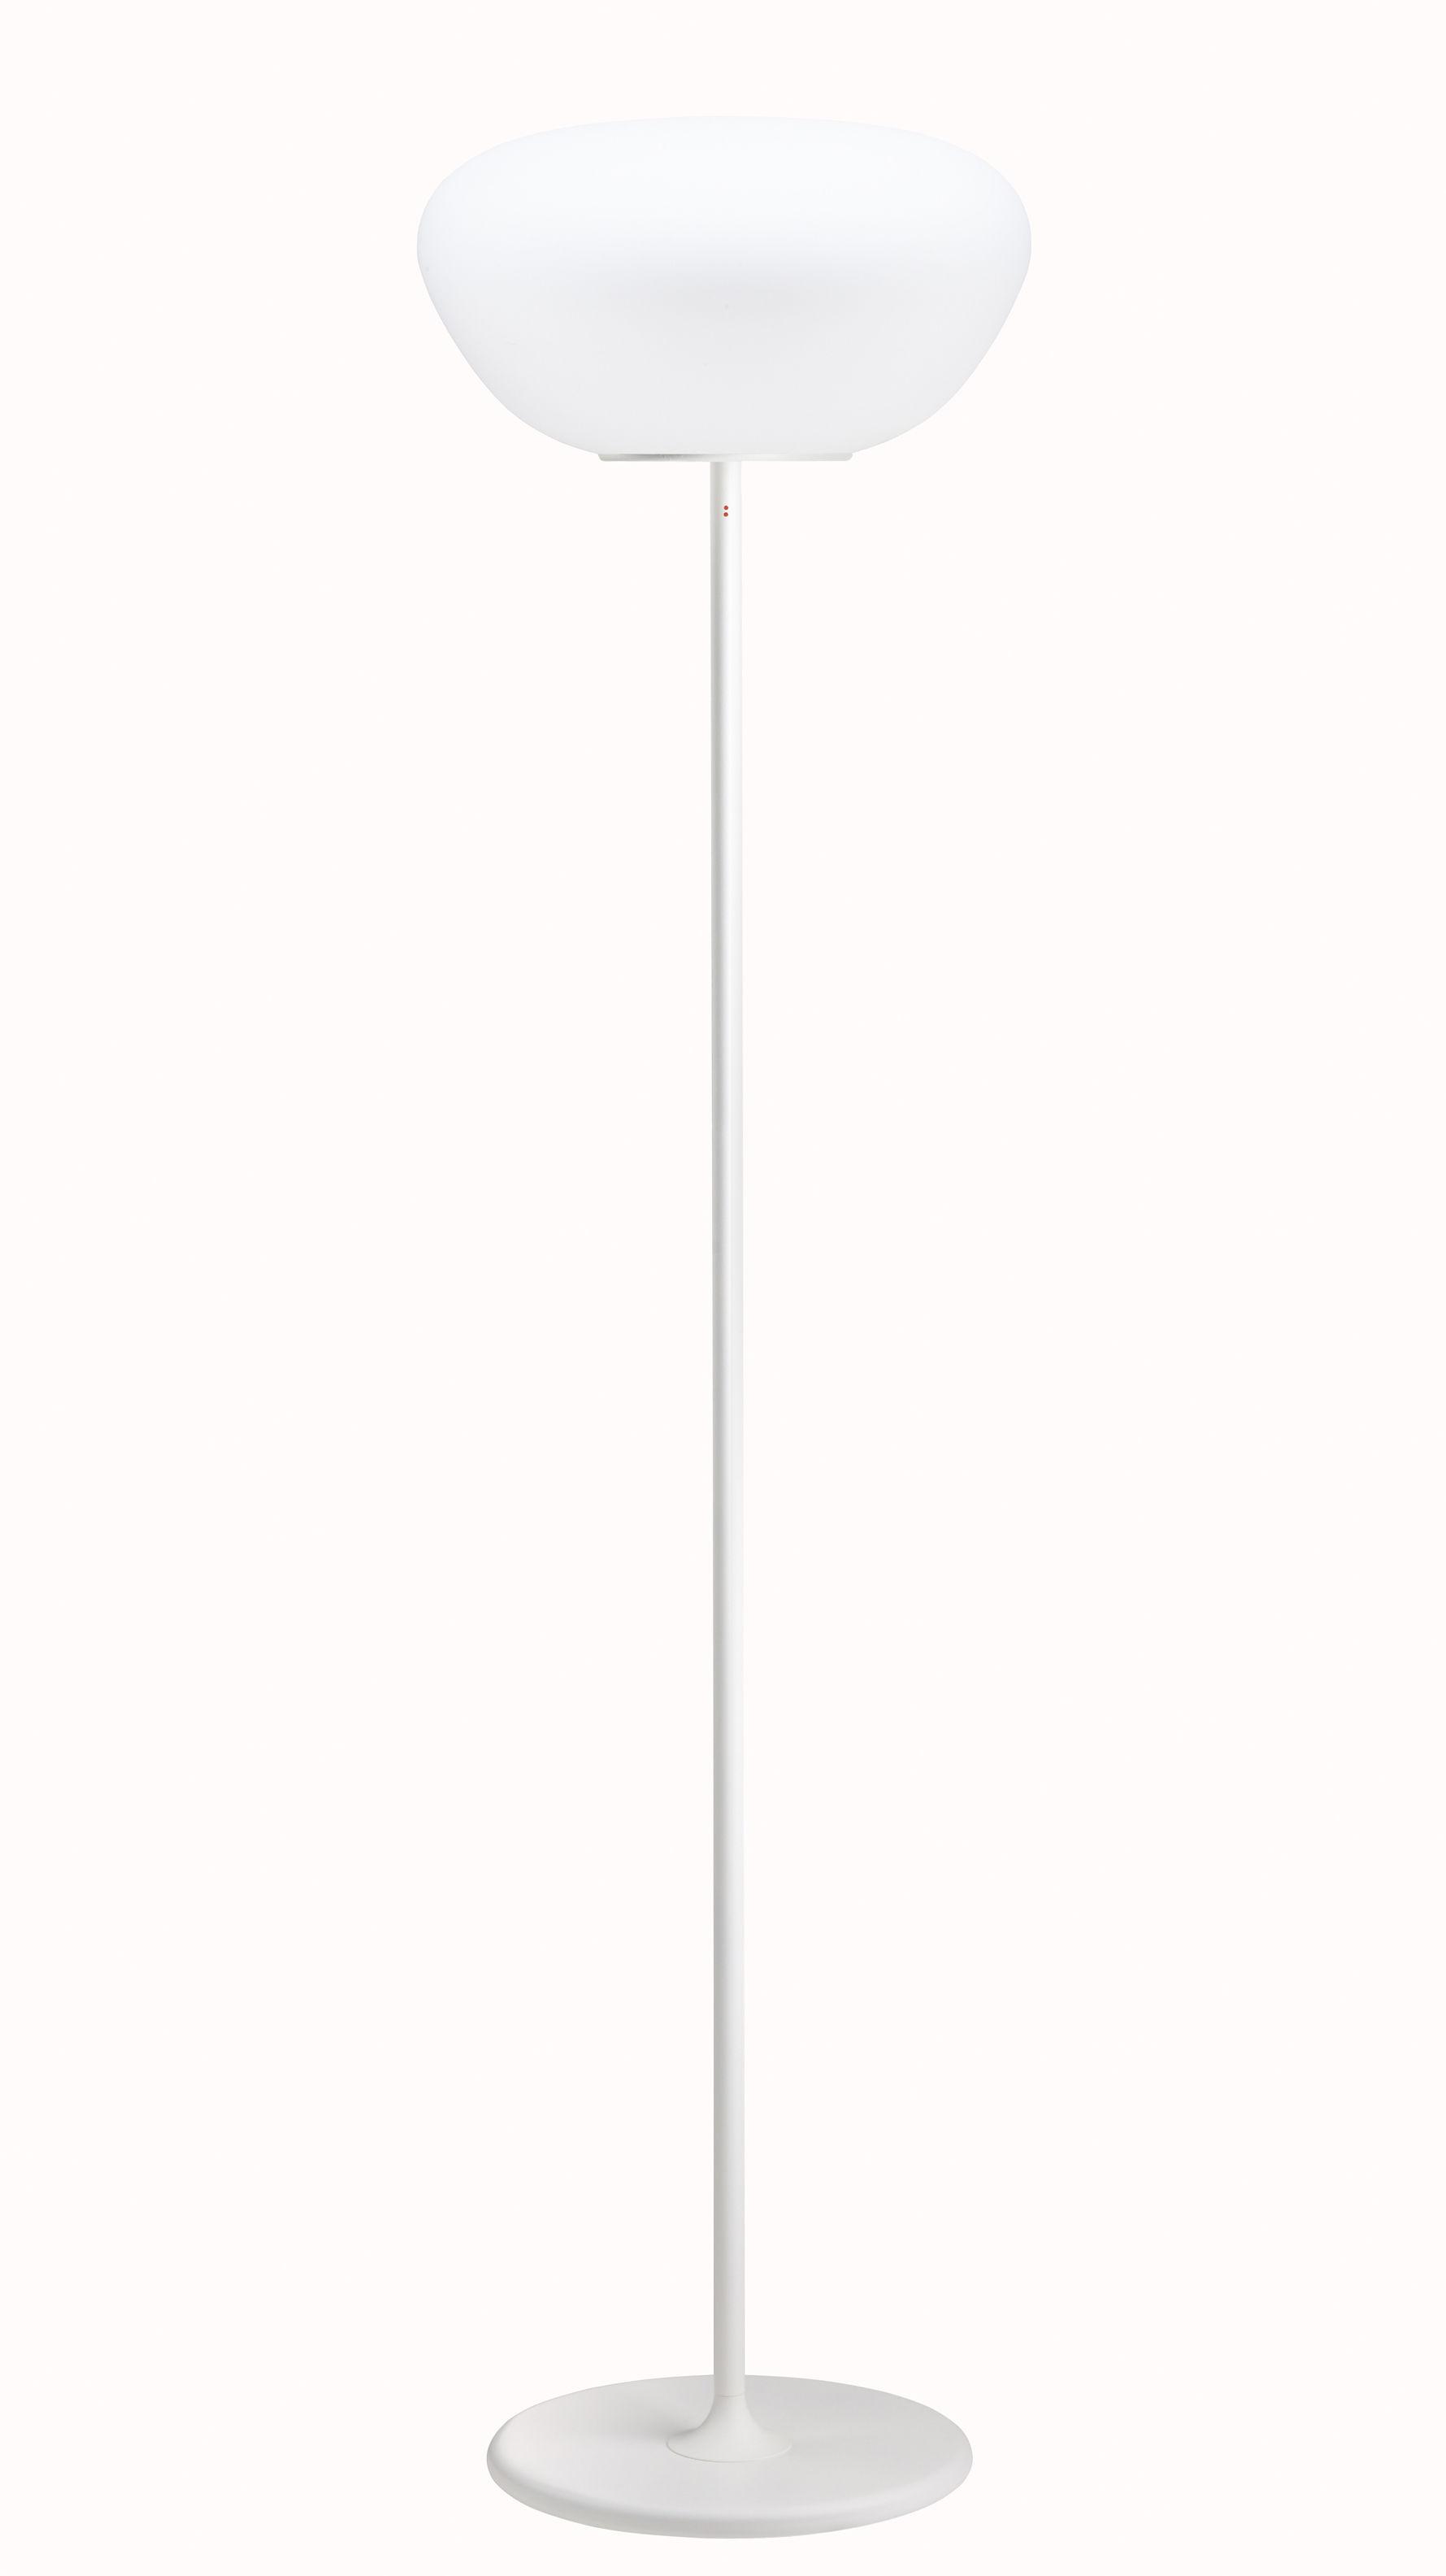 Luminaire - Lampadaires - Lampadaire Poga Ø 42 cm - H 155 cm - Fabbian - Blanc - Verre